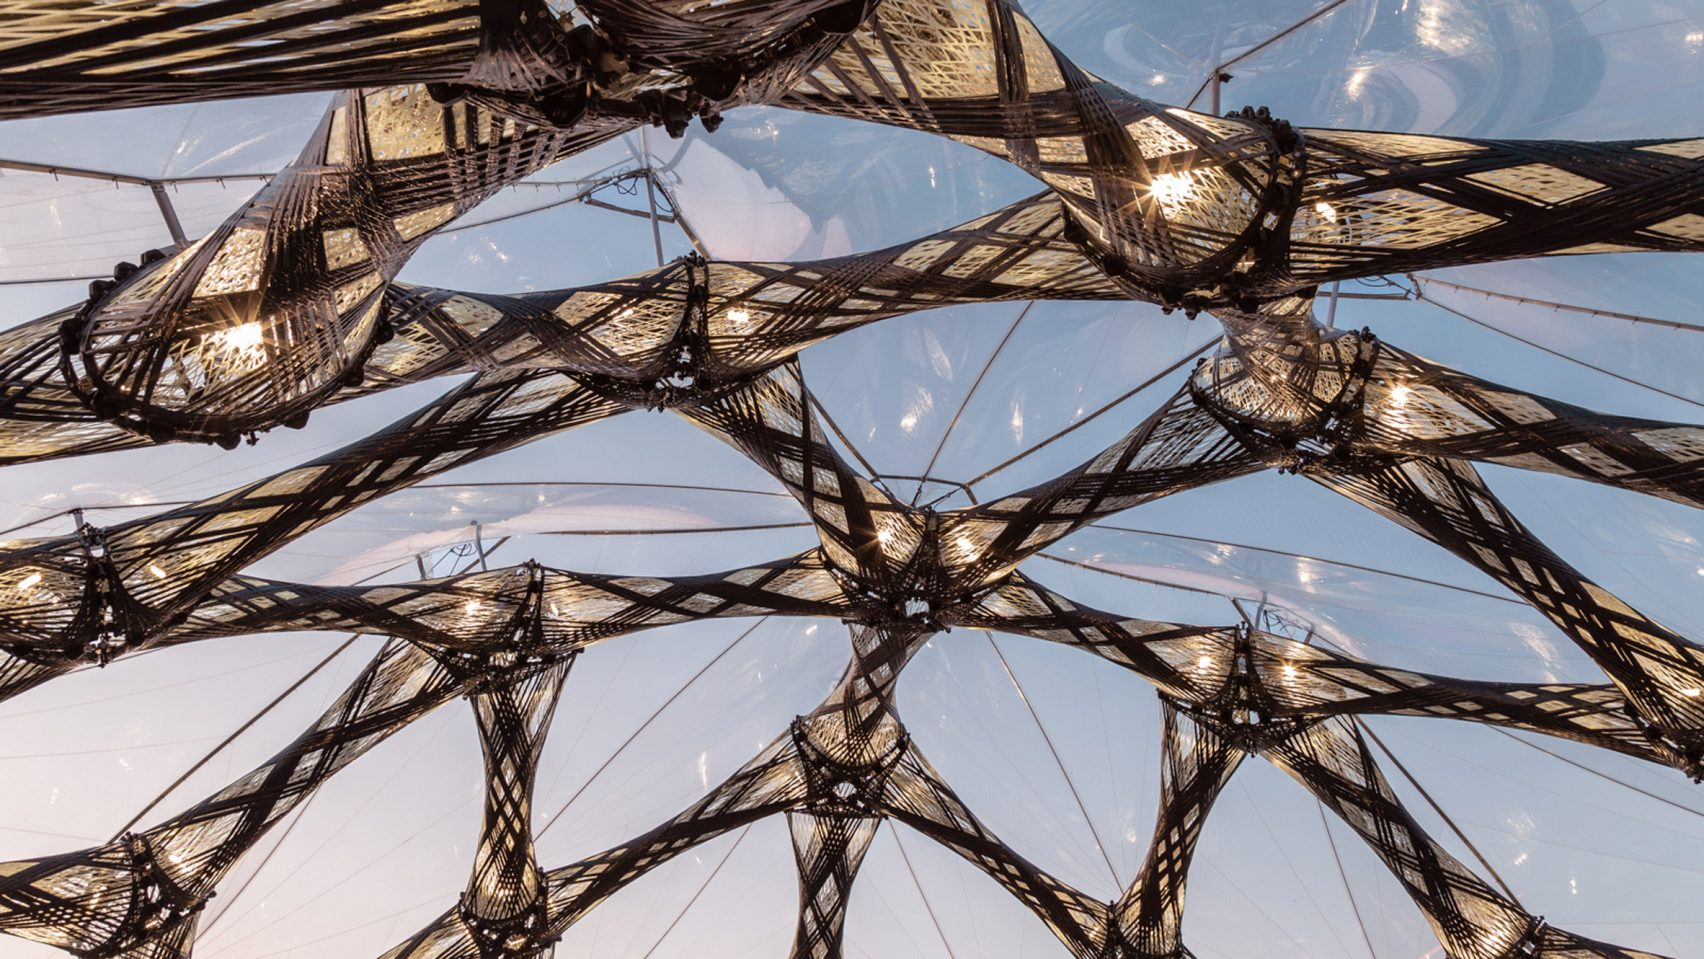 University of Stuttgart creates biomimetic pavilions for the Bundesgartenschau horticultural show in Germany